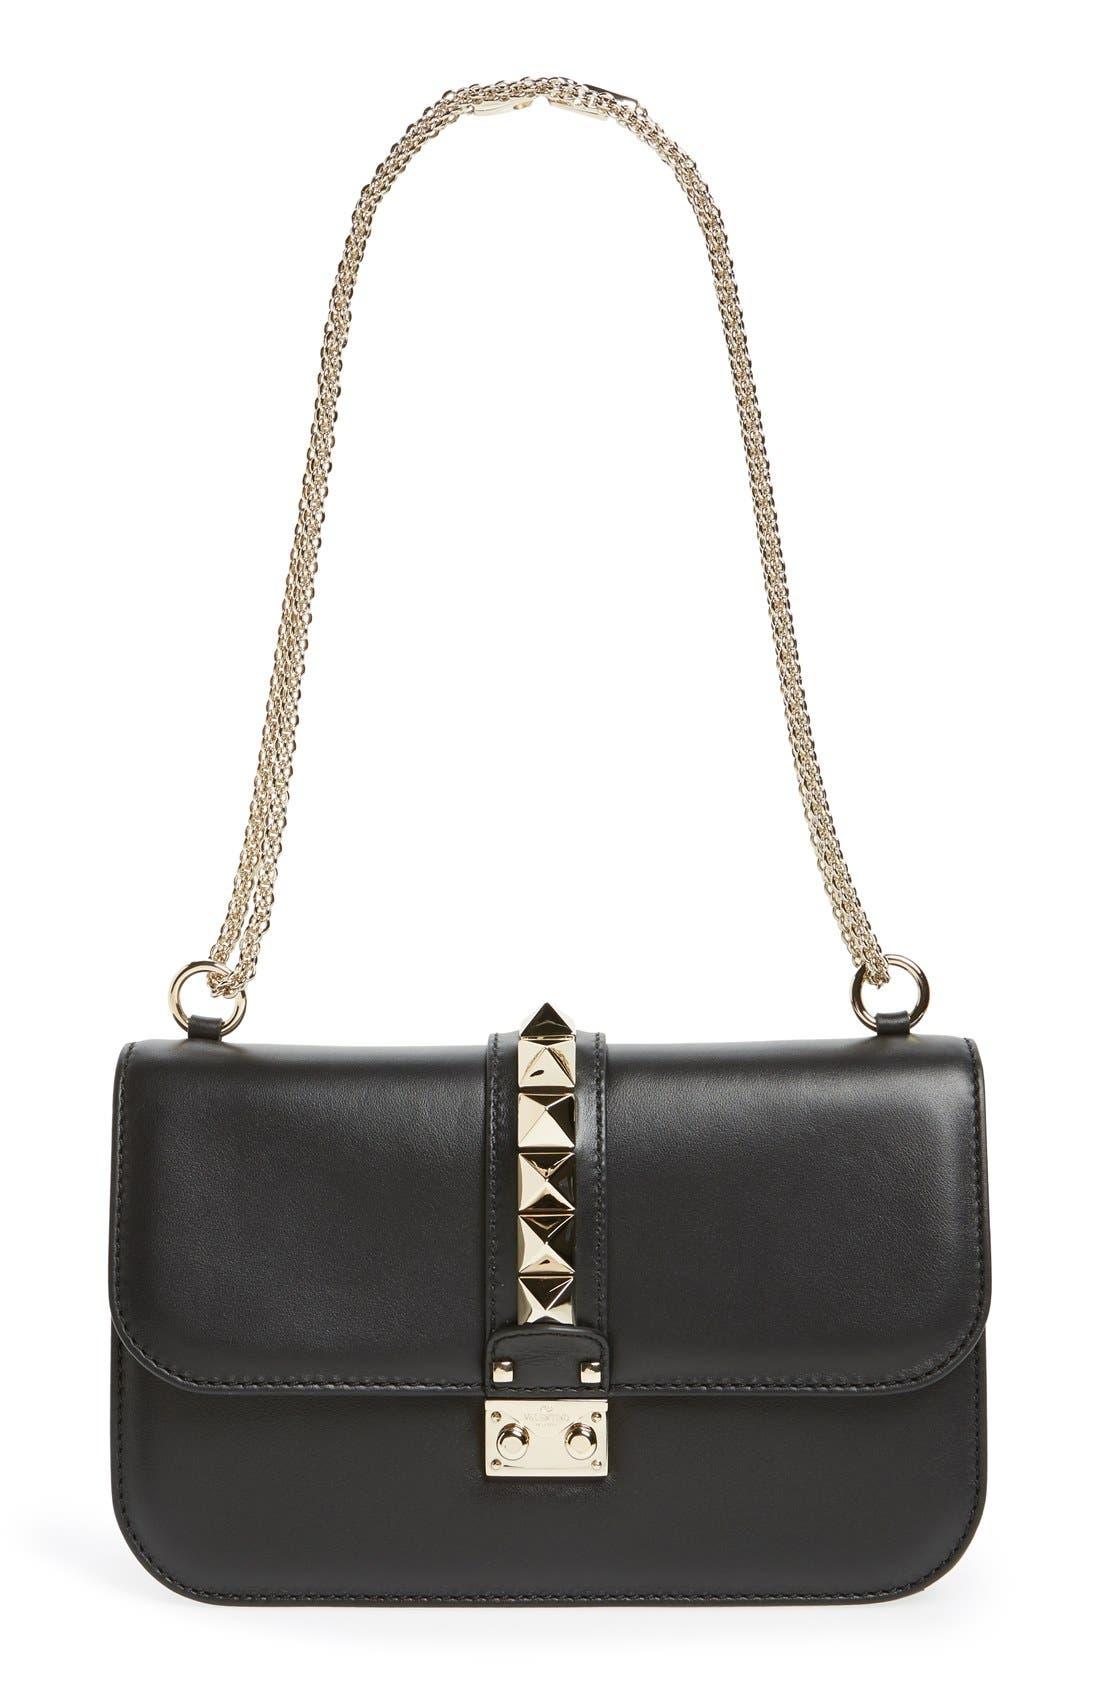 VALENTINO GARAVANI 'Medium Lock' Shoulder Bag